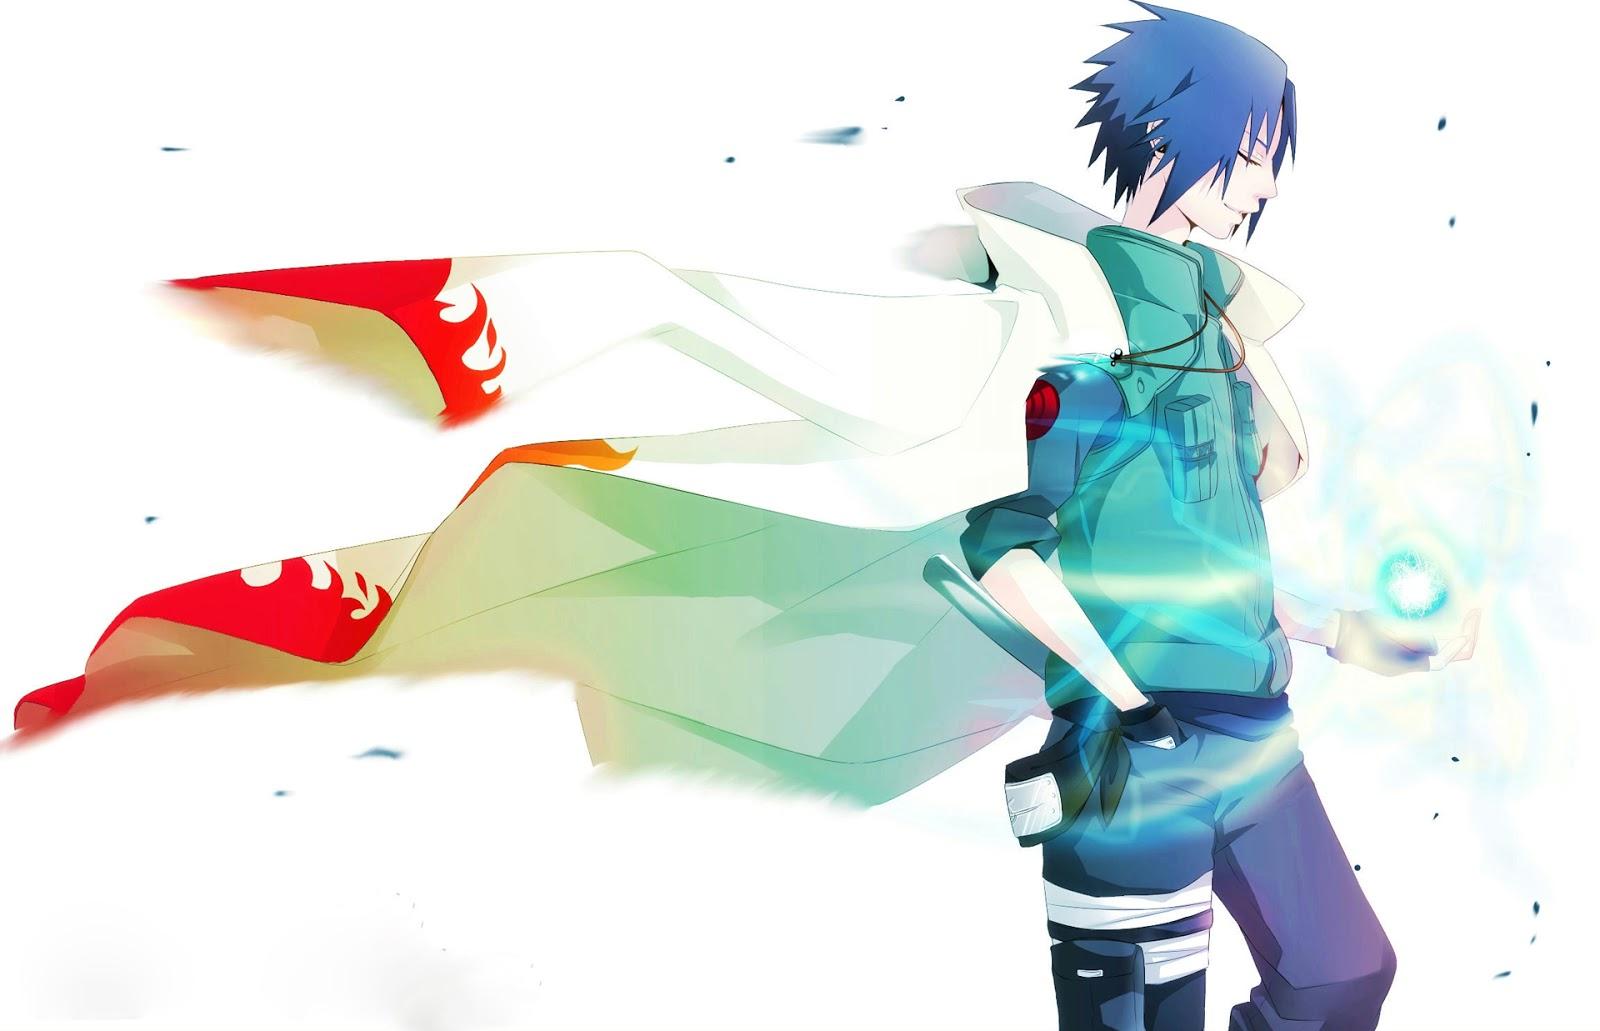 Sasuke Uchiha Anime HD Wallpaper Desktop PC Background 1600x1031